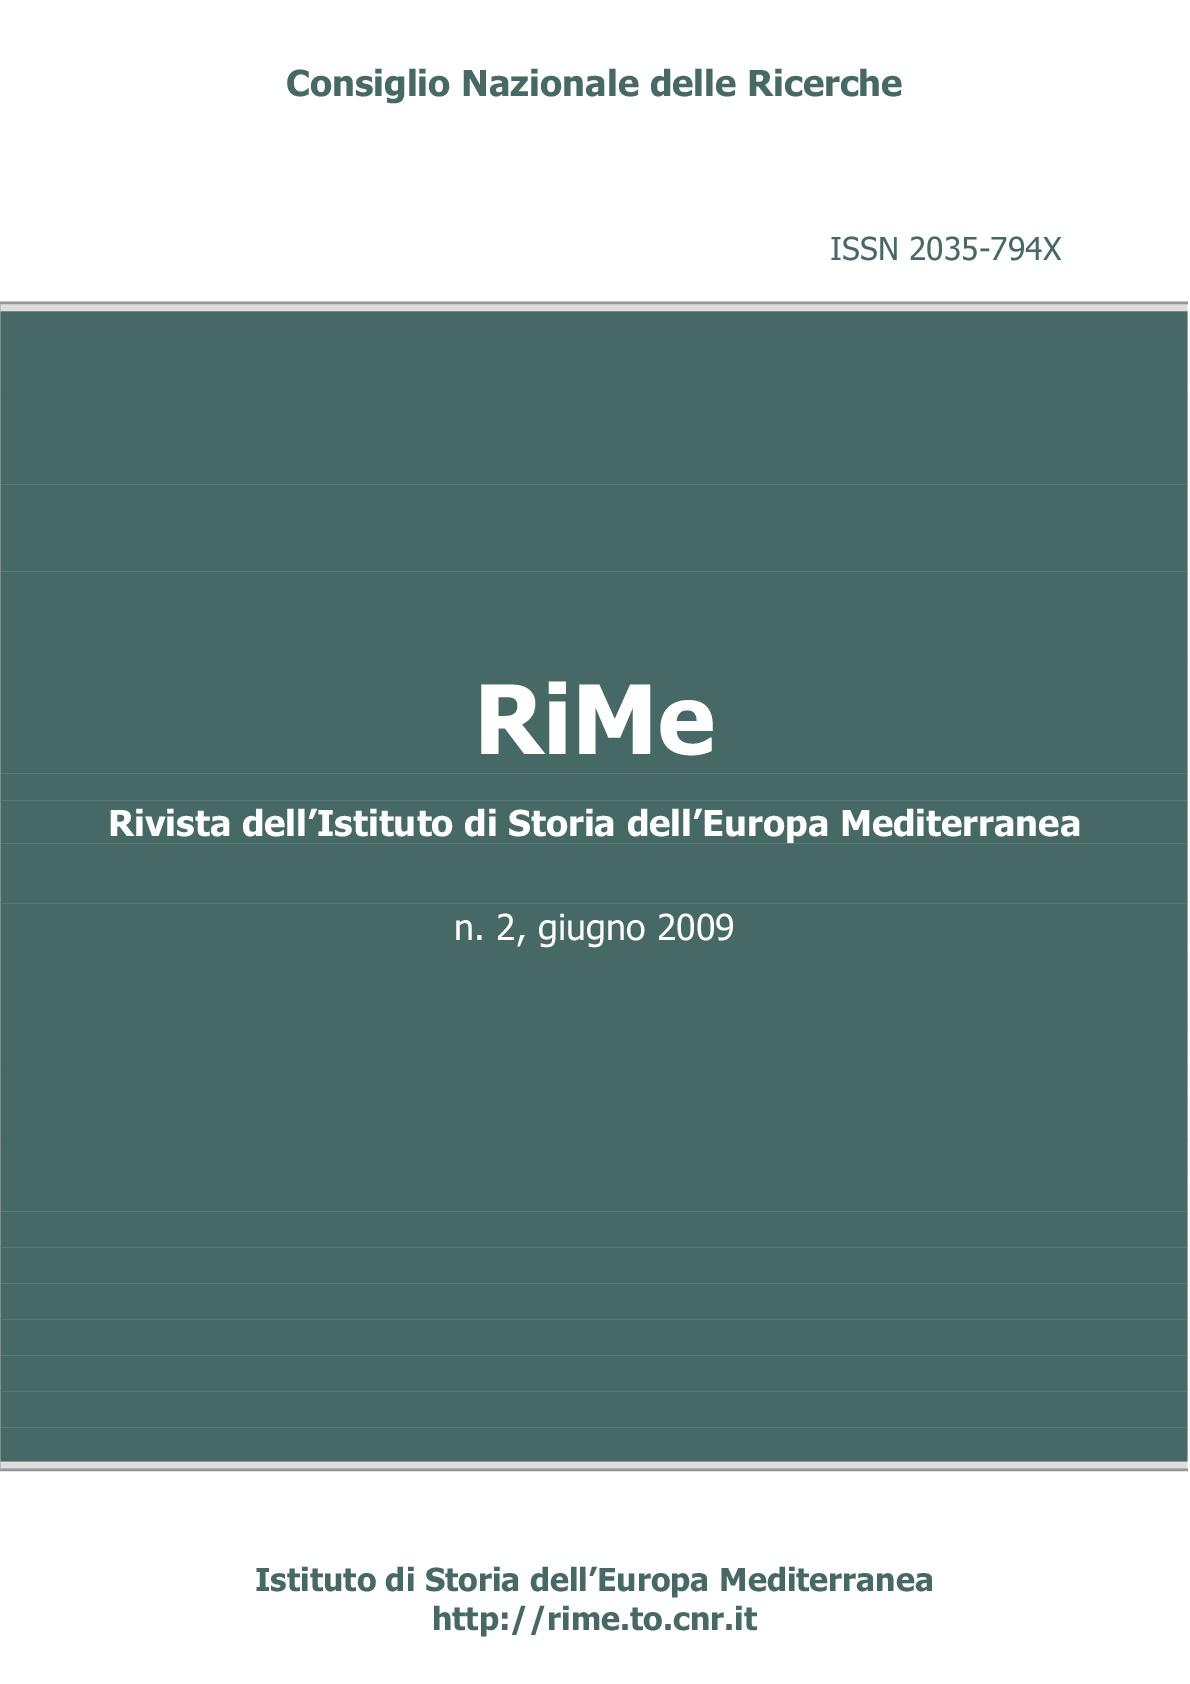 Vol. 2 (June 2009) cover